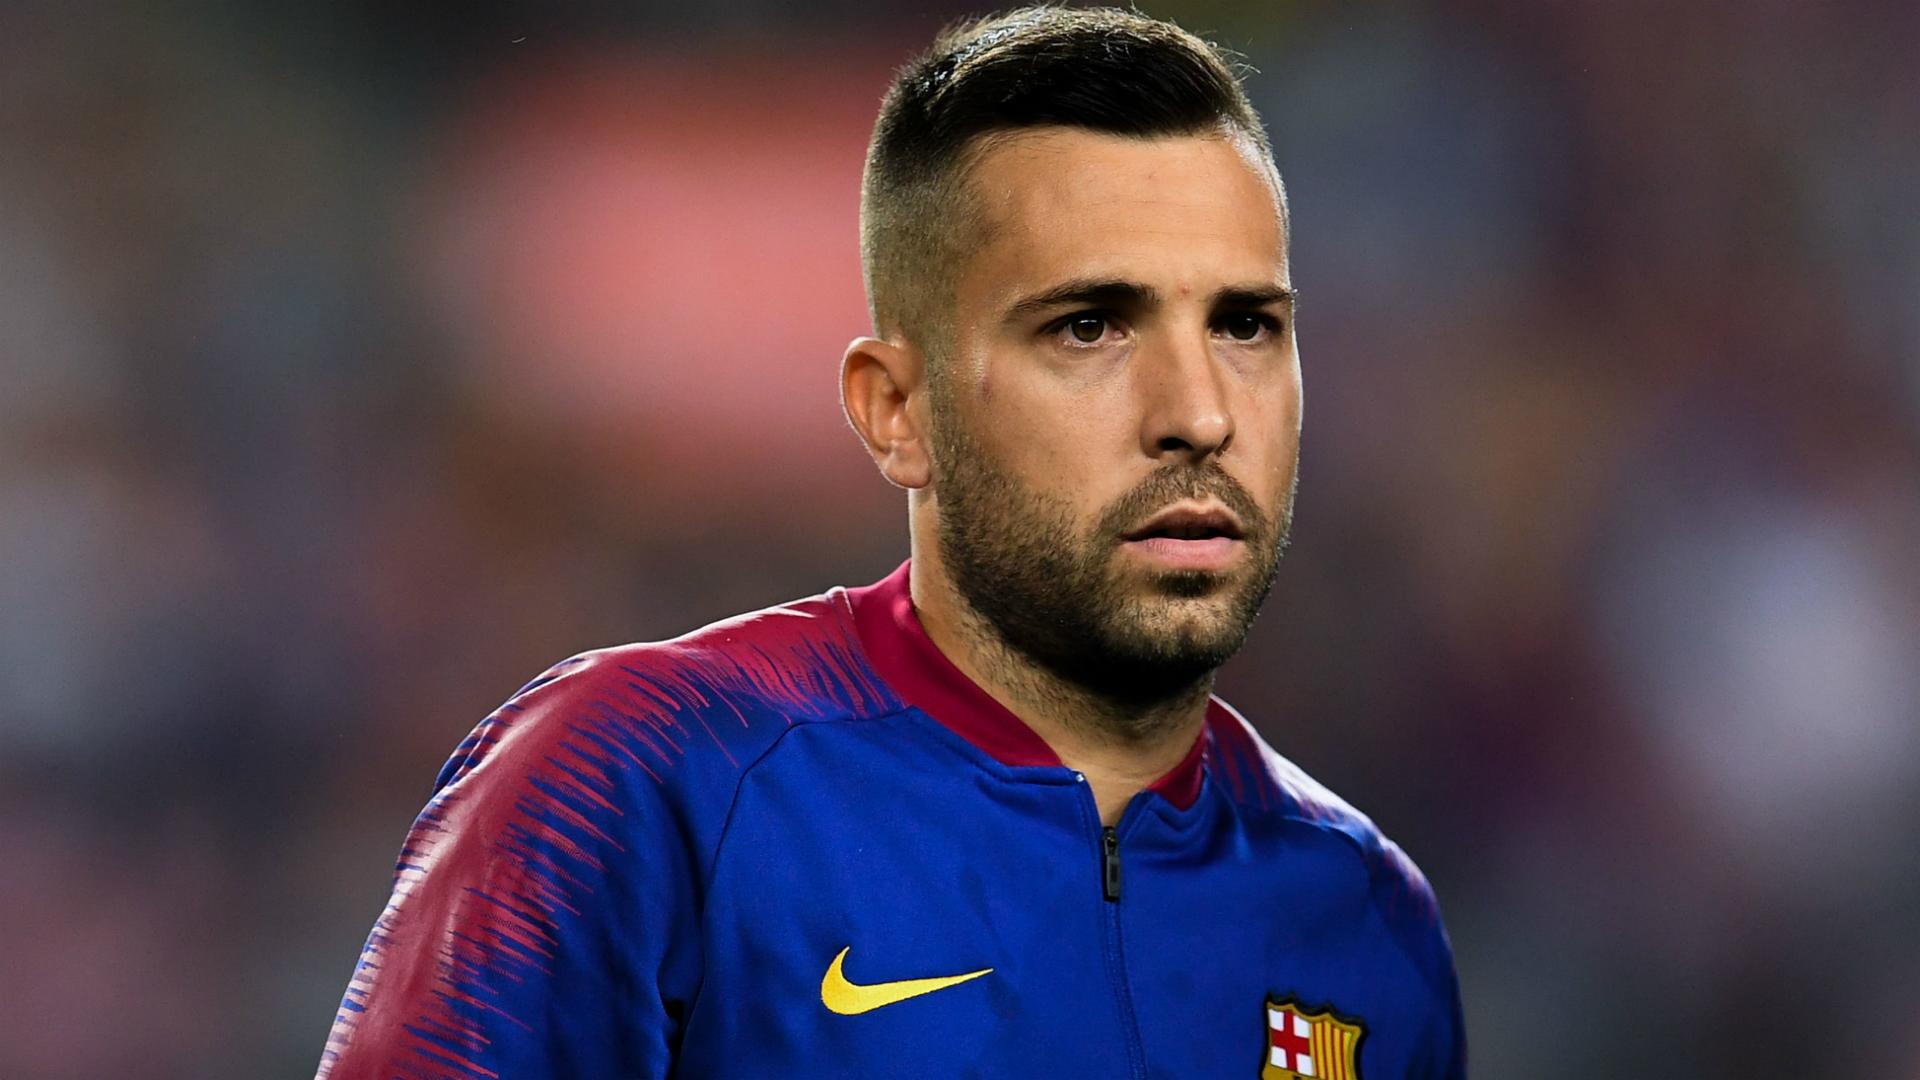 Barca left-back Alba sidelined with hamstring injury